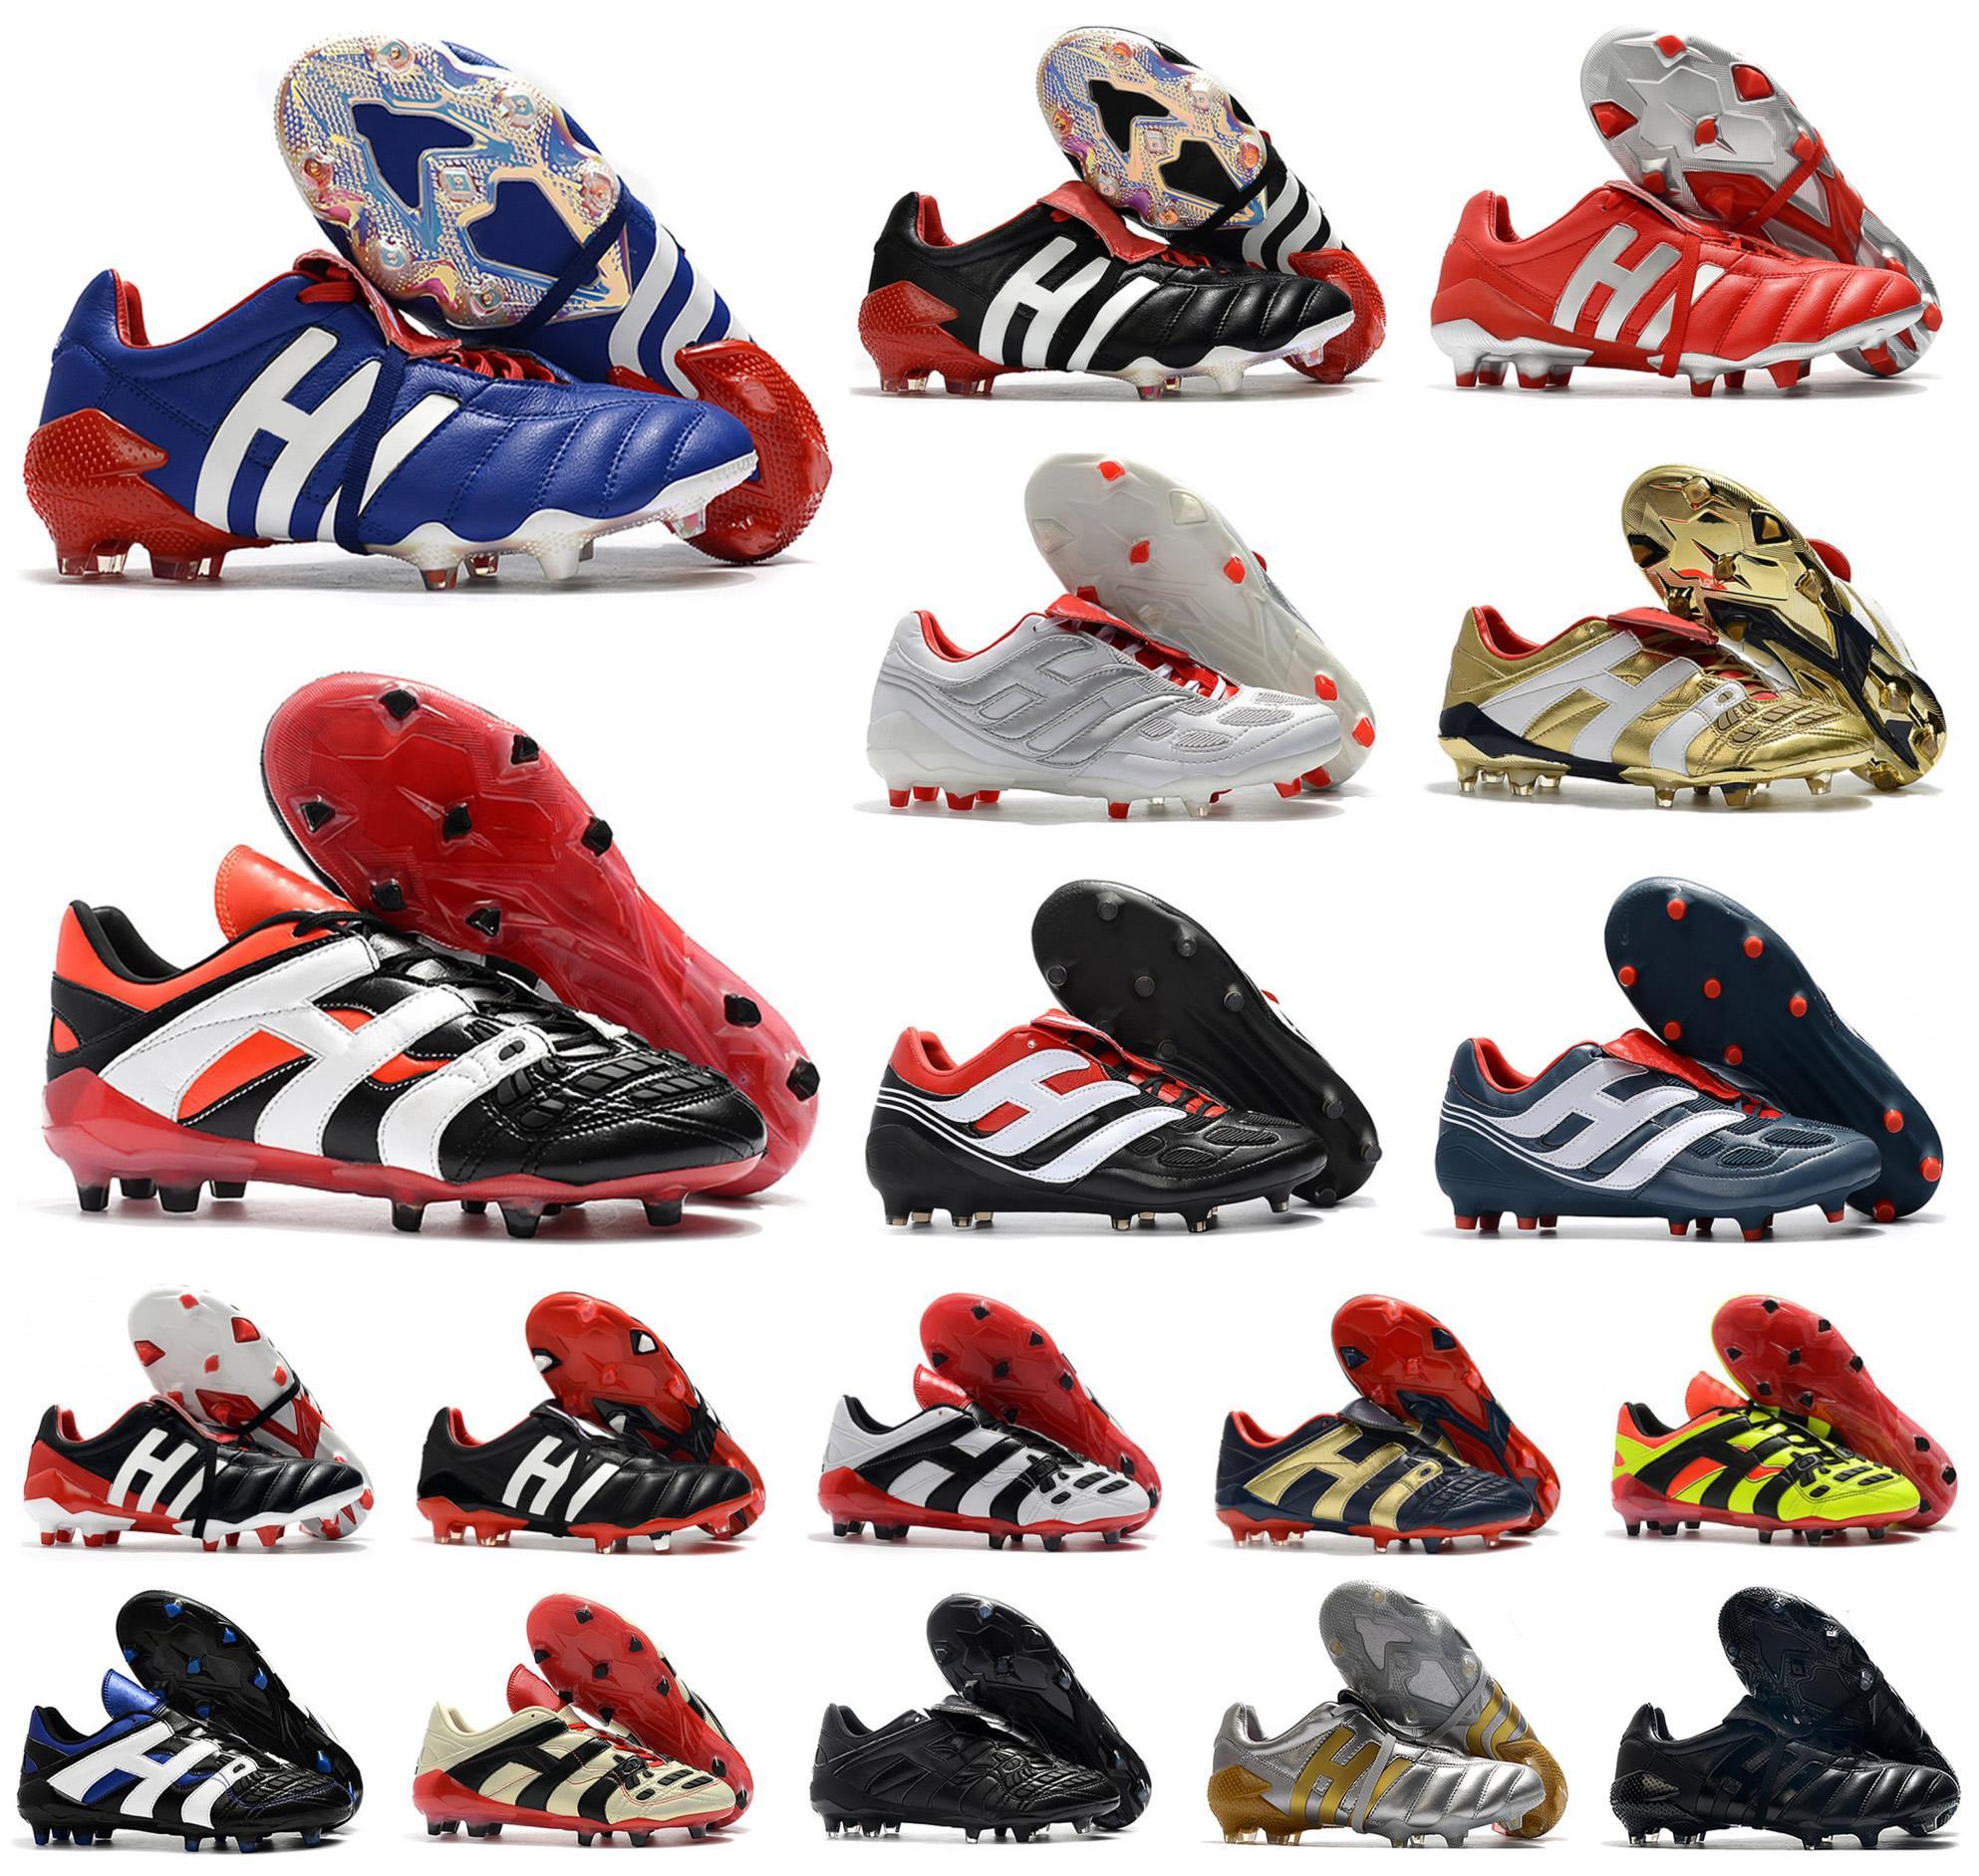 Men Predator 20+ Mutator Mania Tormentor Accelerator Electricity Precision FG Beckham DB Zidane ZZ soccer shoes cleats football boots 6.5-11